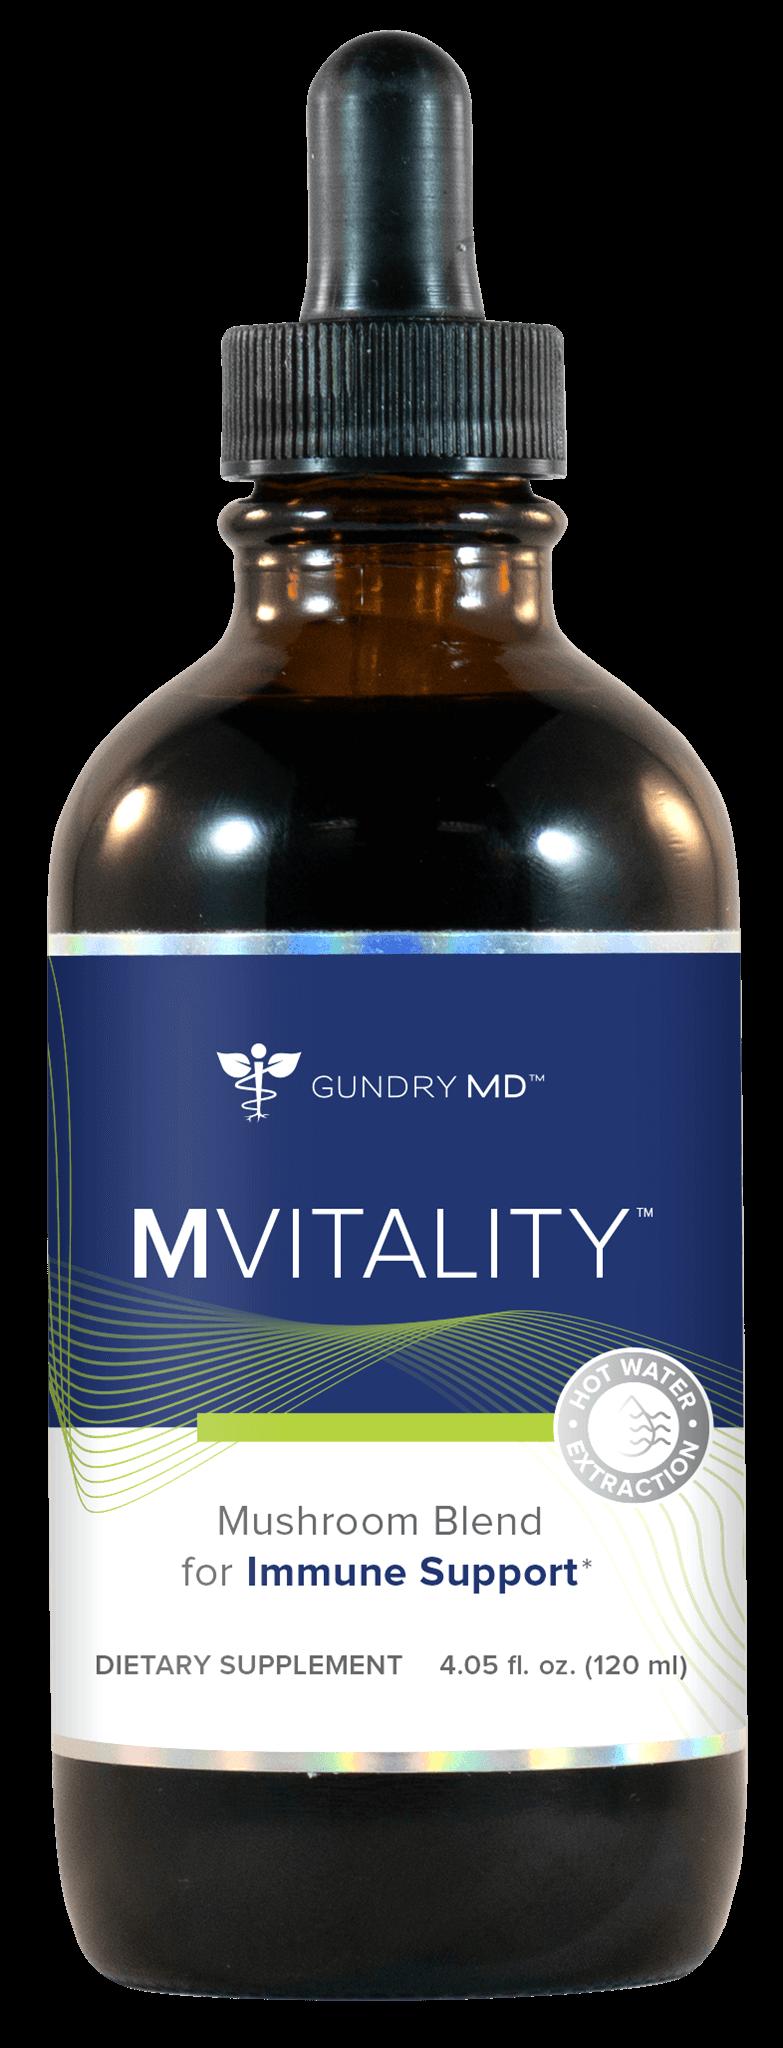 M Vitality